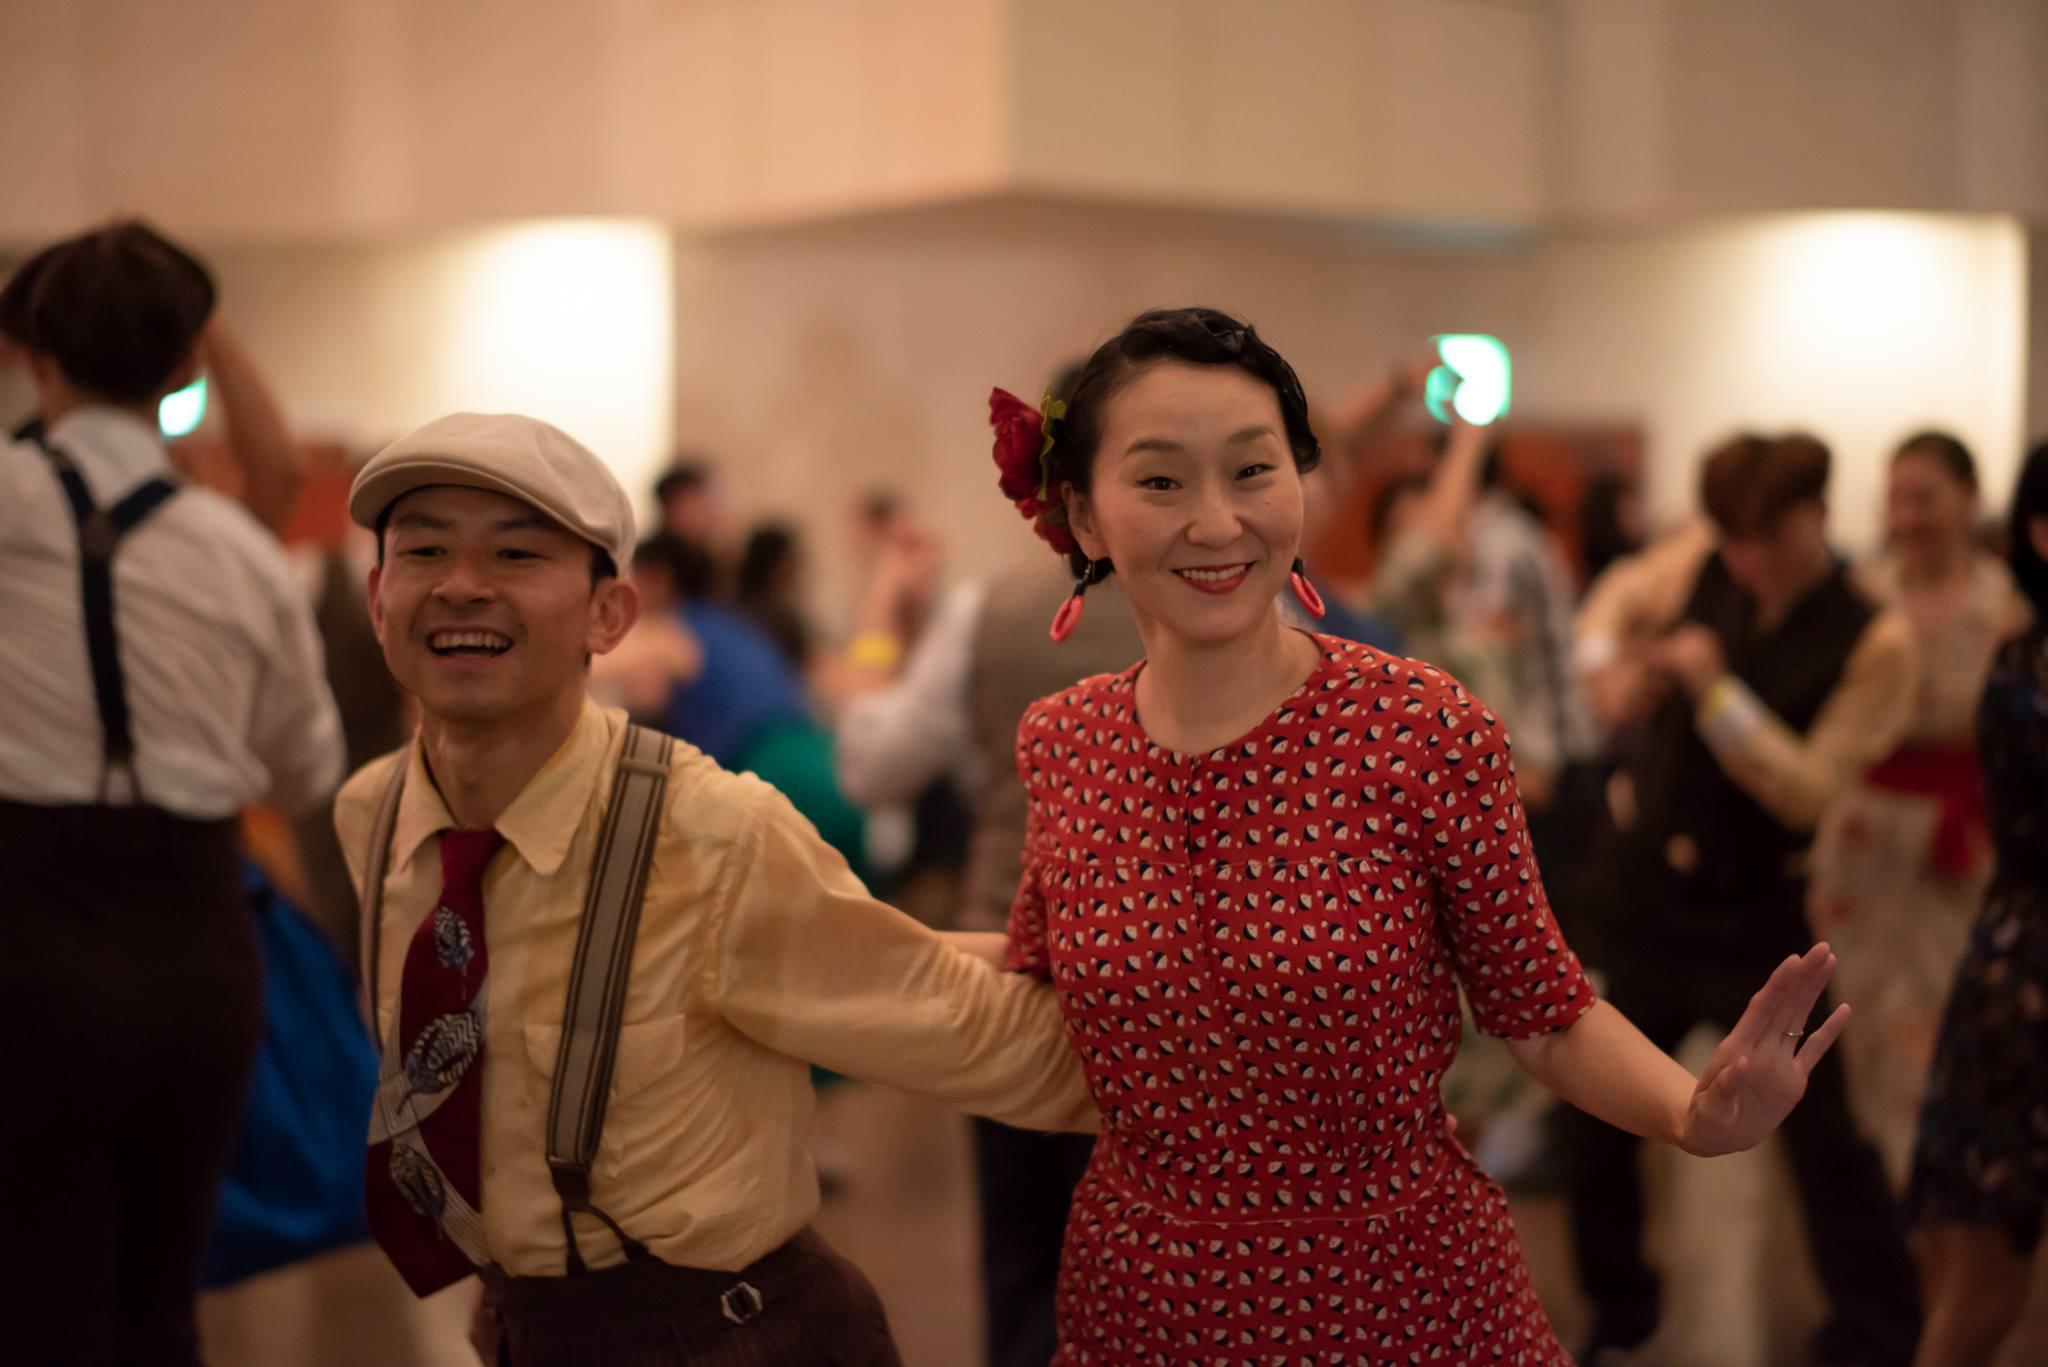 Eiji Nishida and Mariko Okamoto by Hideaki Okamatsu